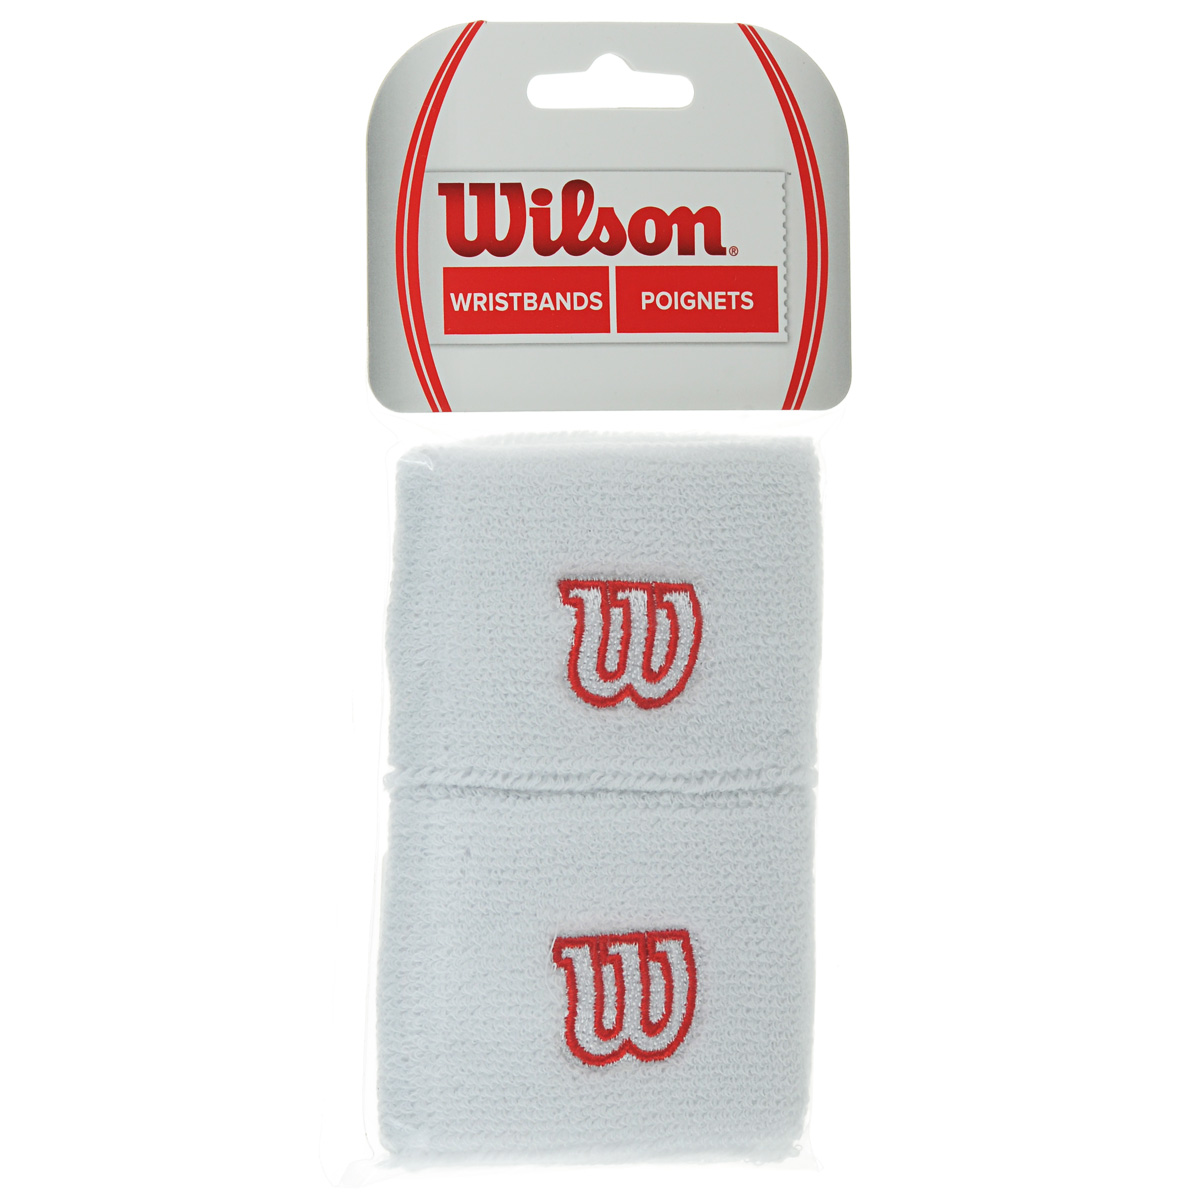 Напульсник Wilson Wristband, цвет: белый, 2 шт. Размер универсальный цена